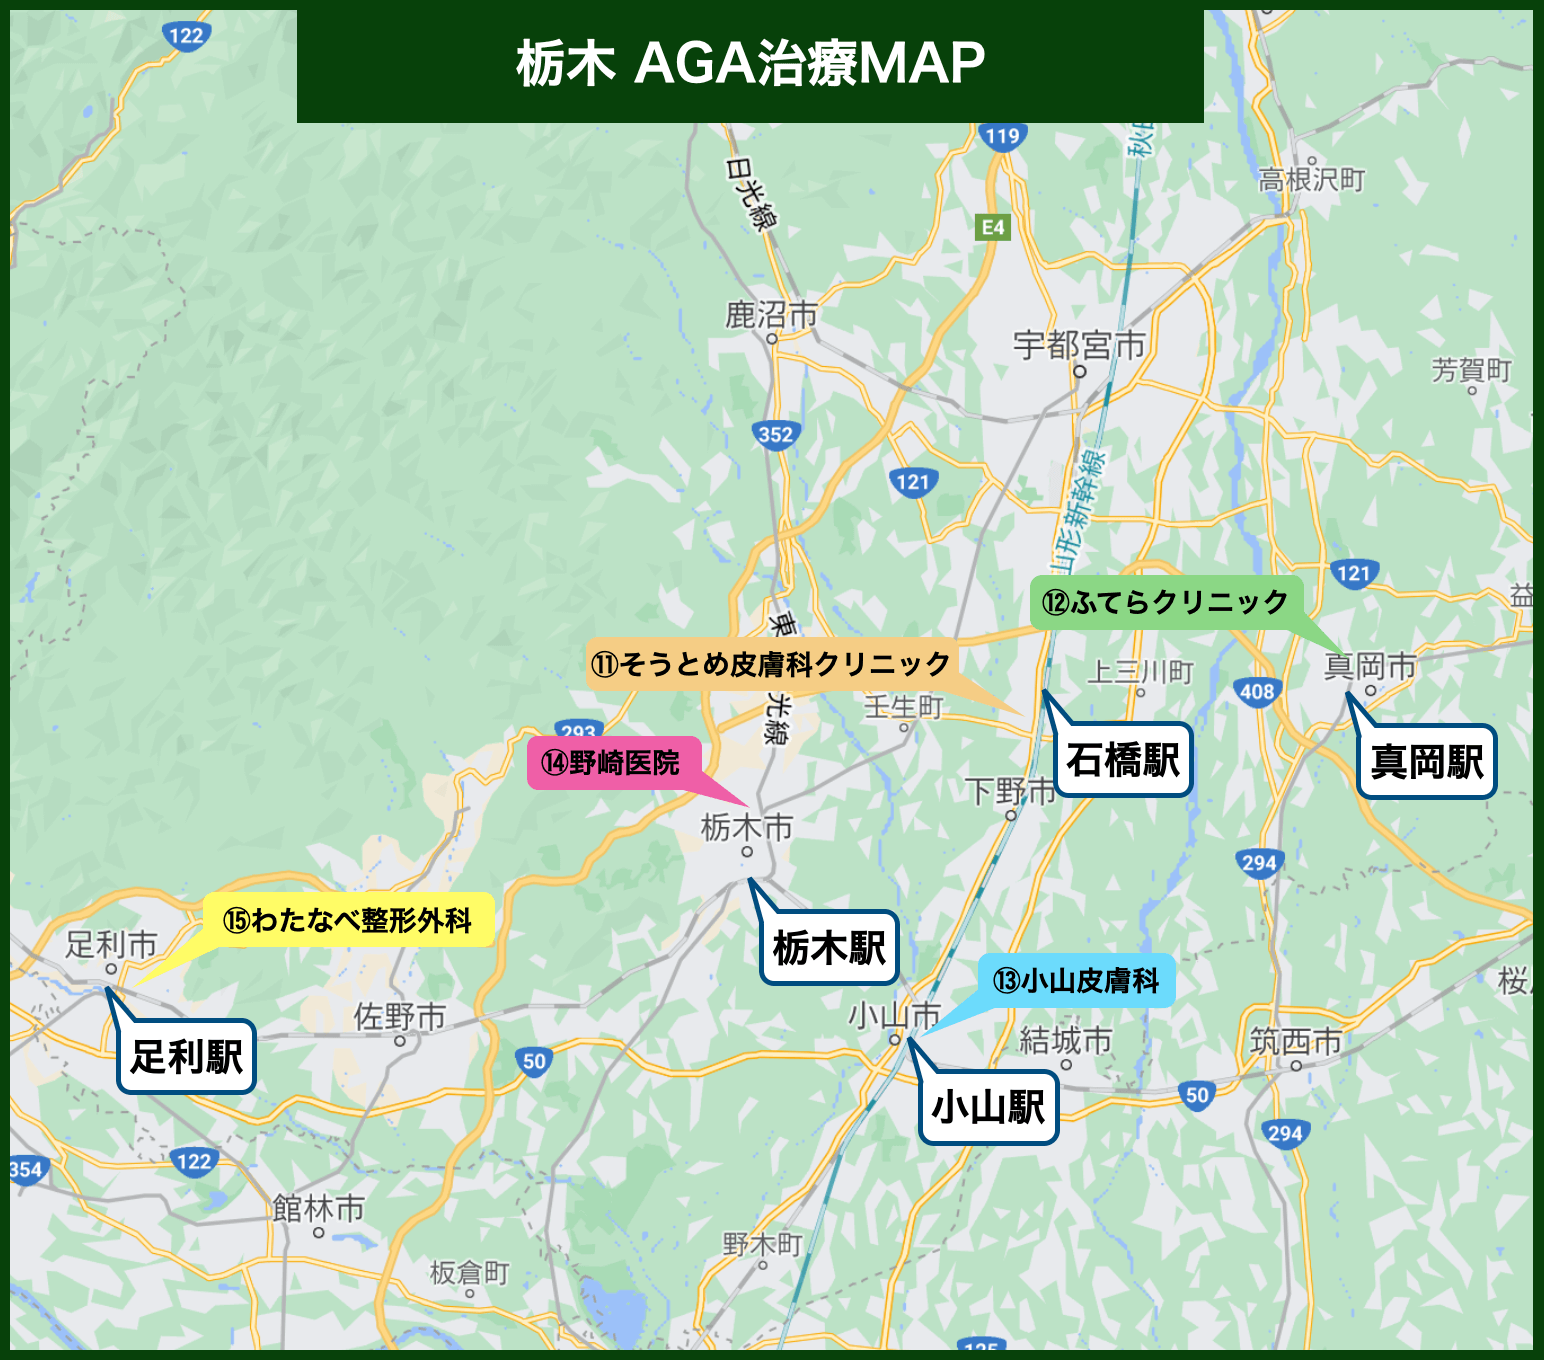 栃木 AGA治療MAP